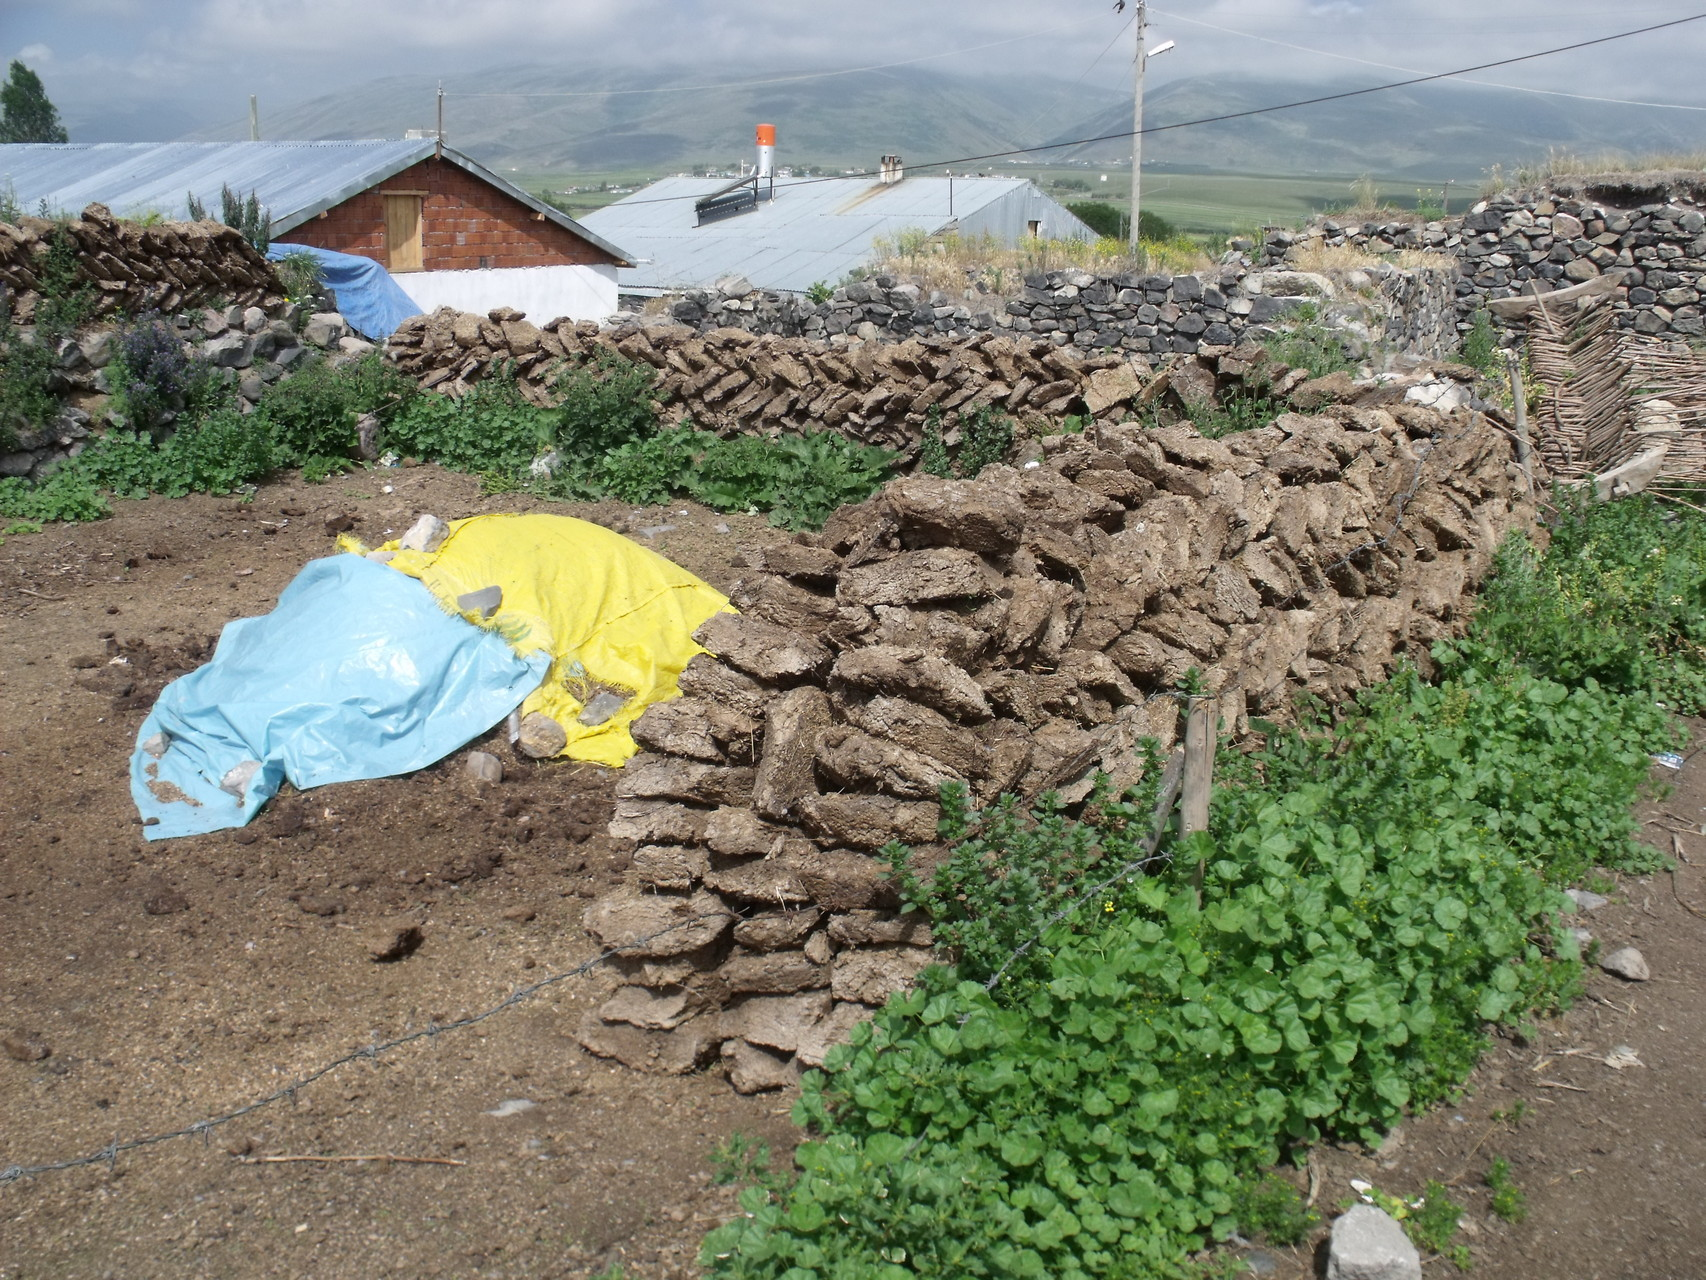 Kuhdung als Brennmaterial in Kurdistan i